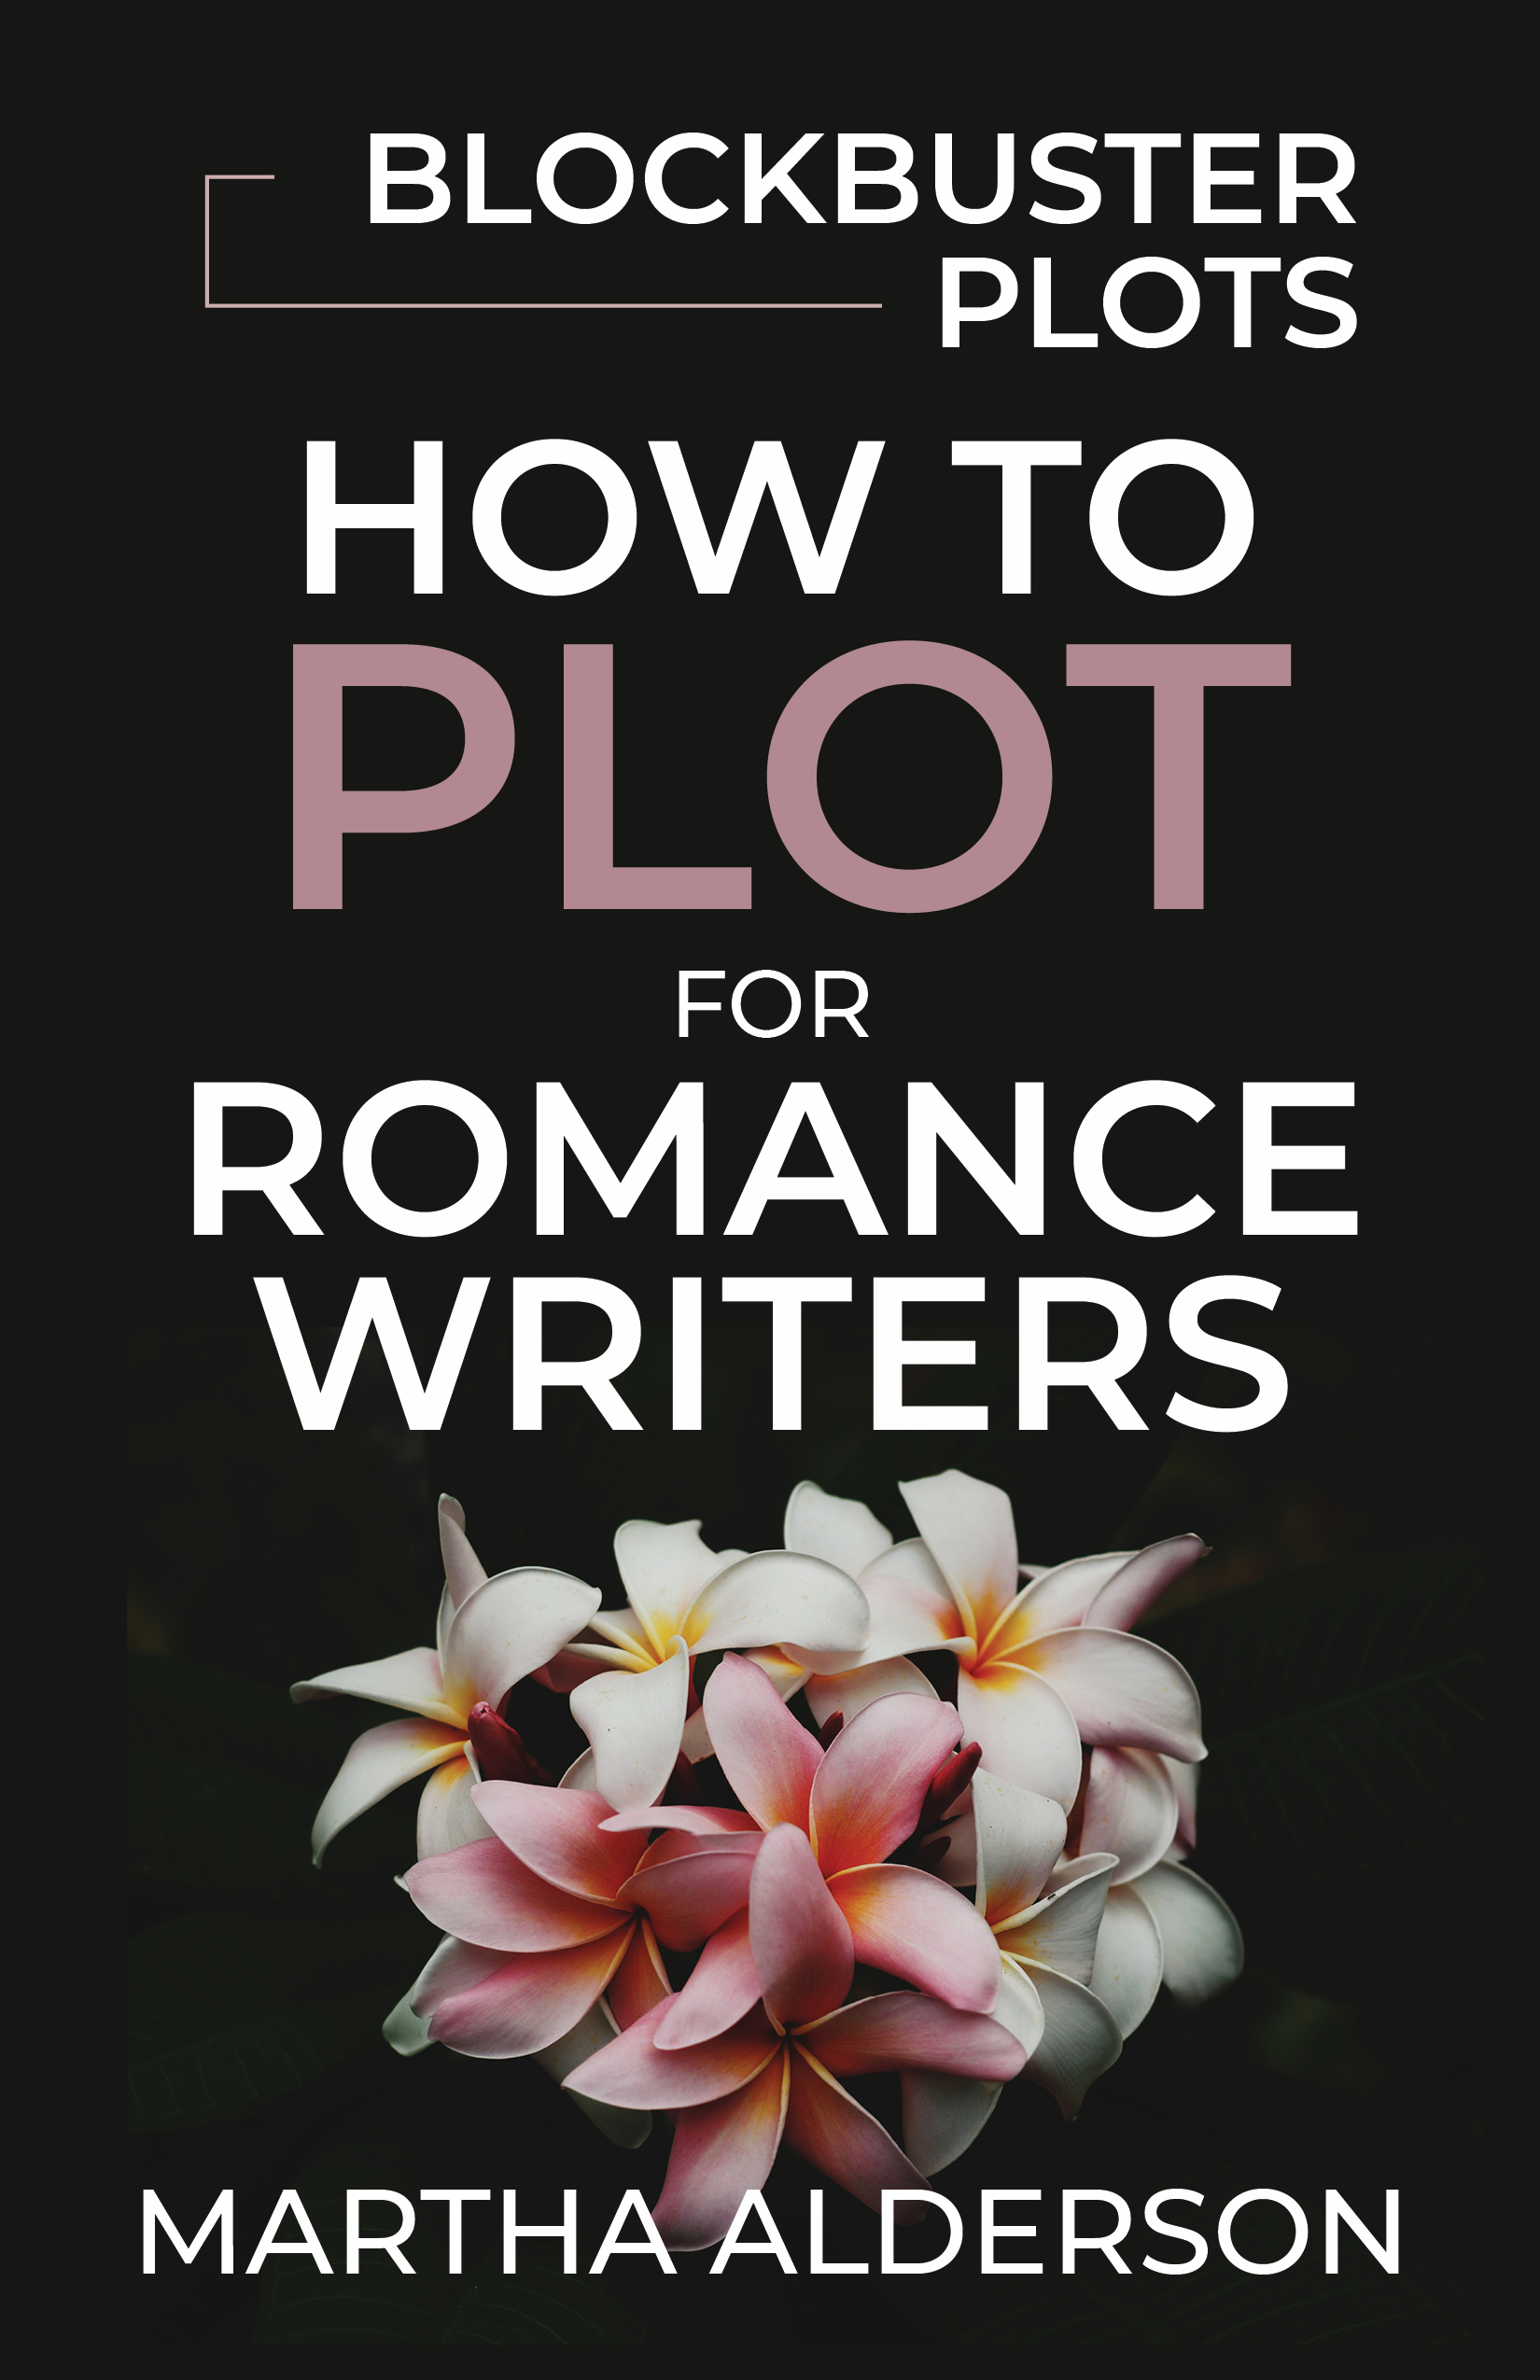 Blockbuster Plots How to Plot for Romance